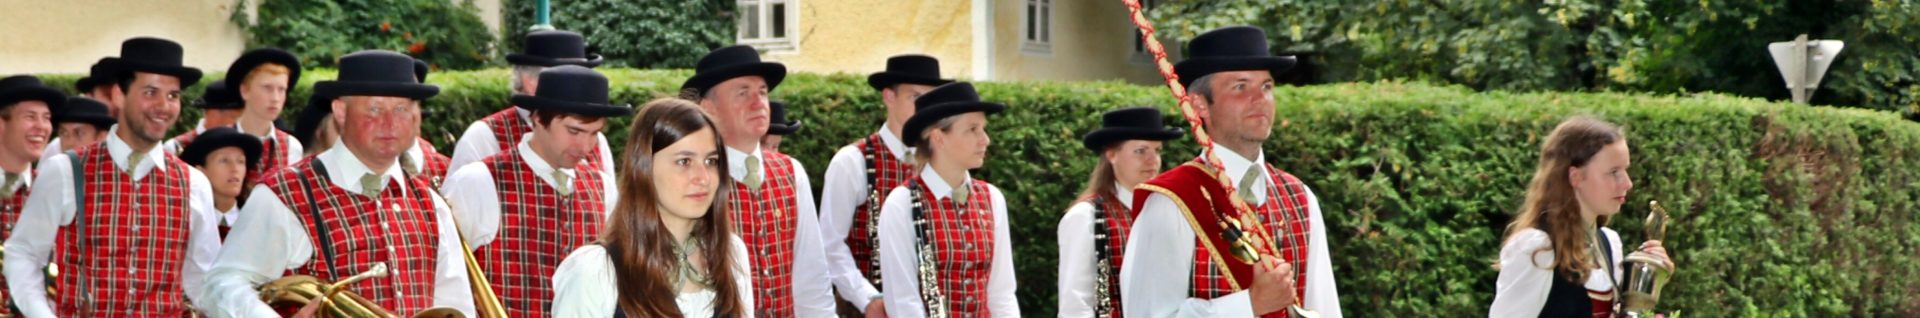 Musikkapelle Puch